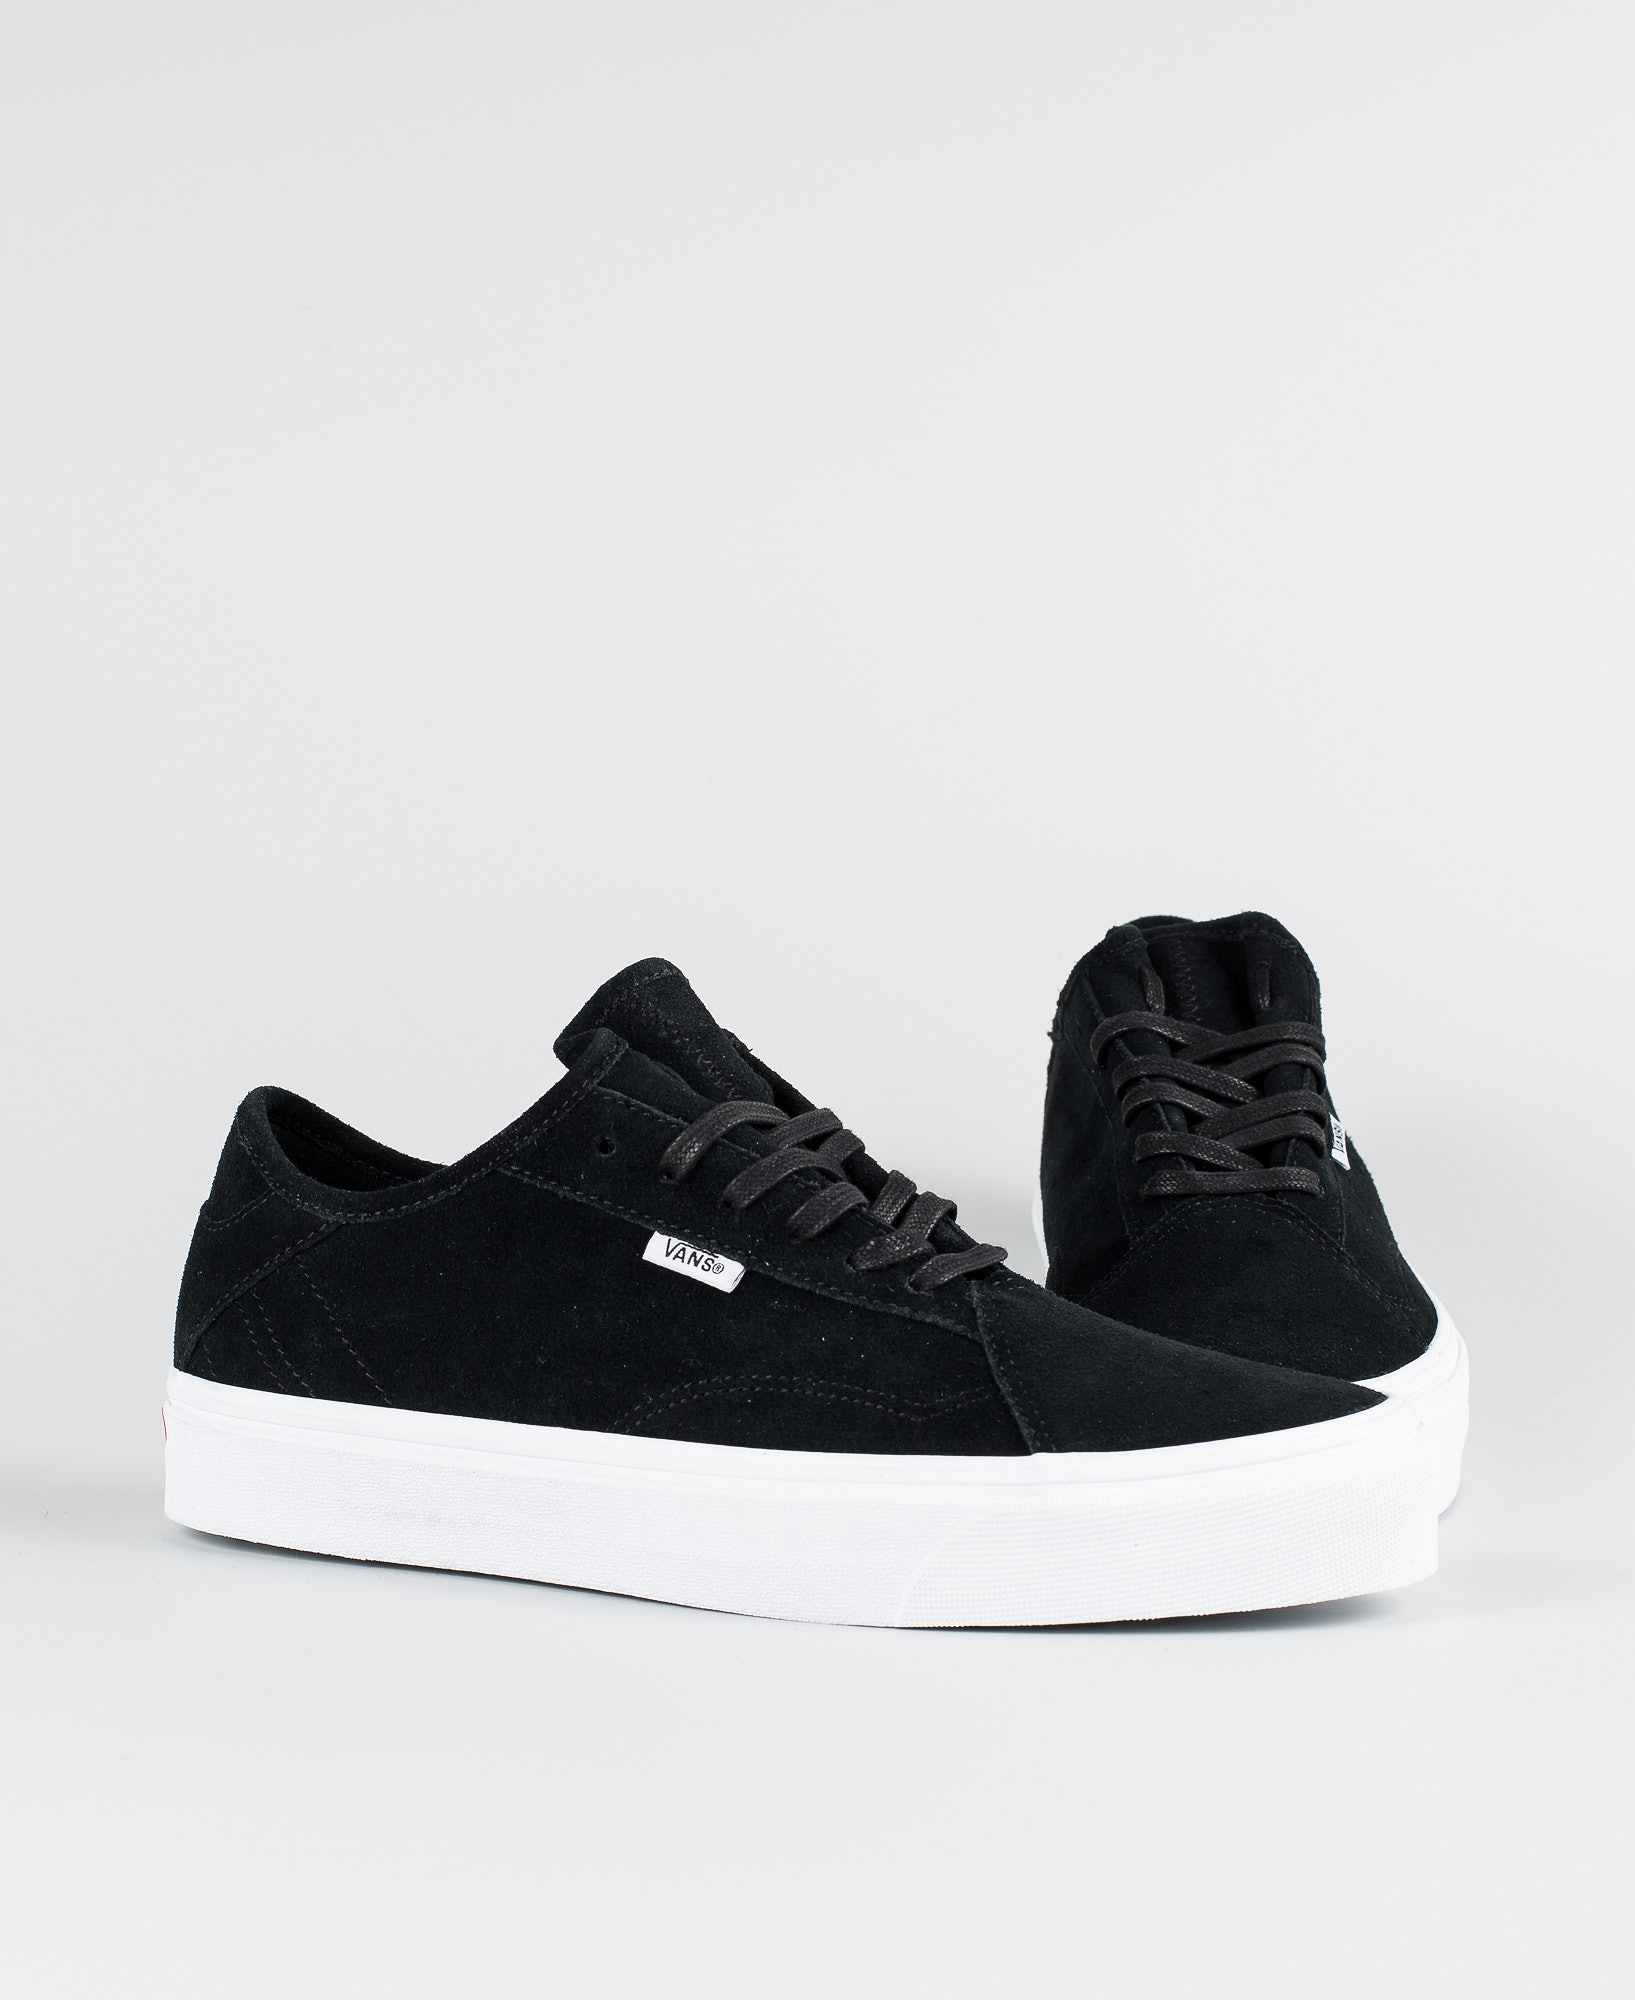 6d52f53856 Vans Diamo Ni Shoes (Suede) Black True White - Ridestore.com